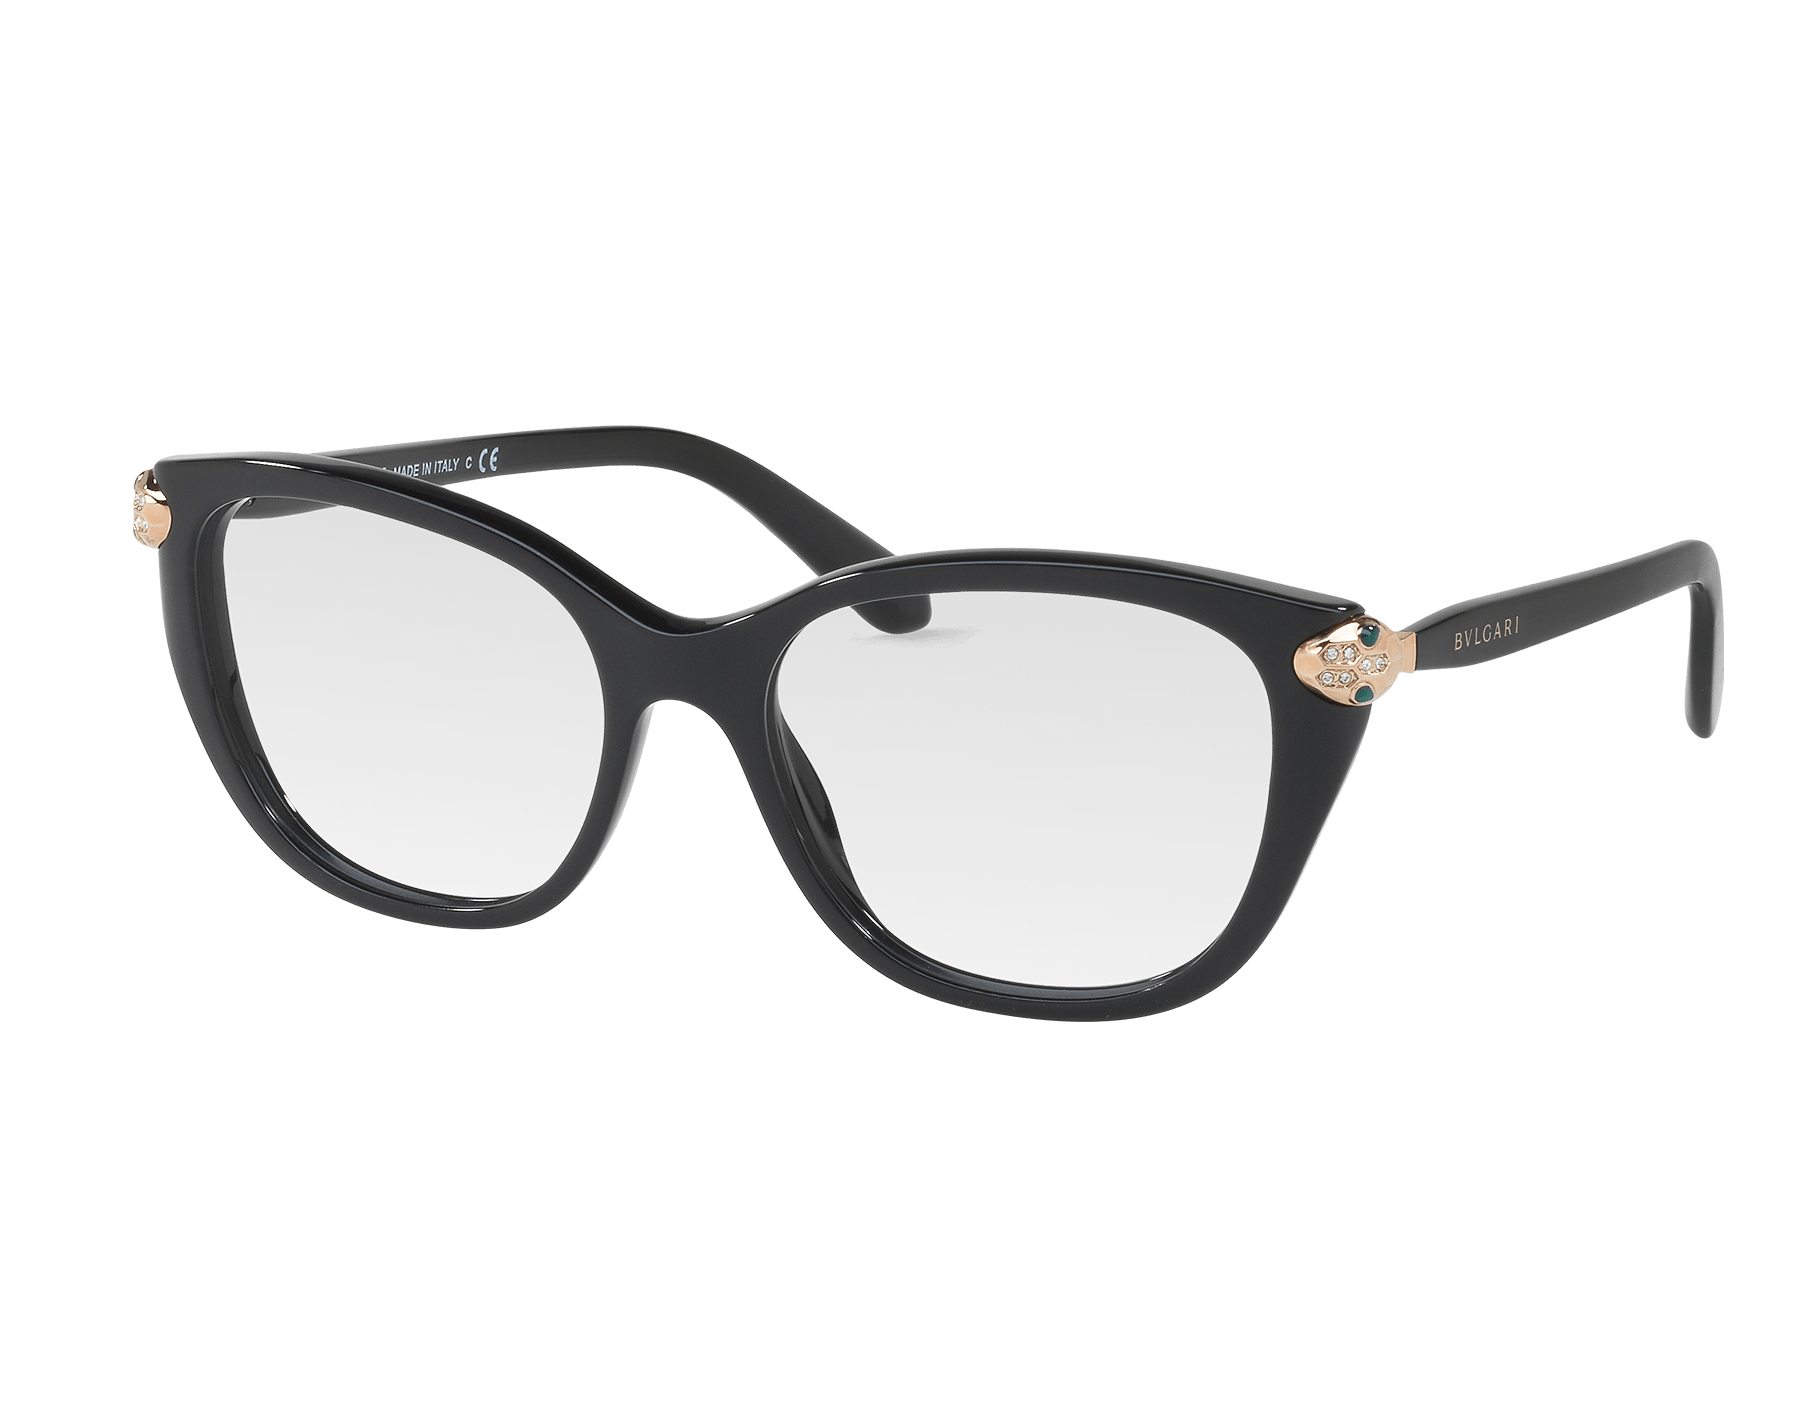 Serpenti 柔美貓眼醋酸纖維太陽眼鏡,飾以琺瑯和水晶。 903366 image 1